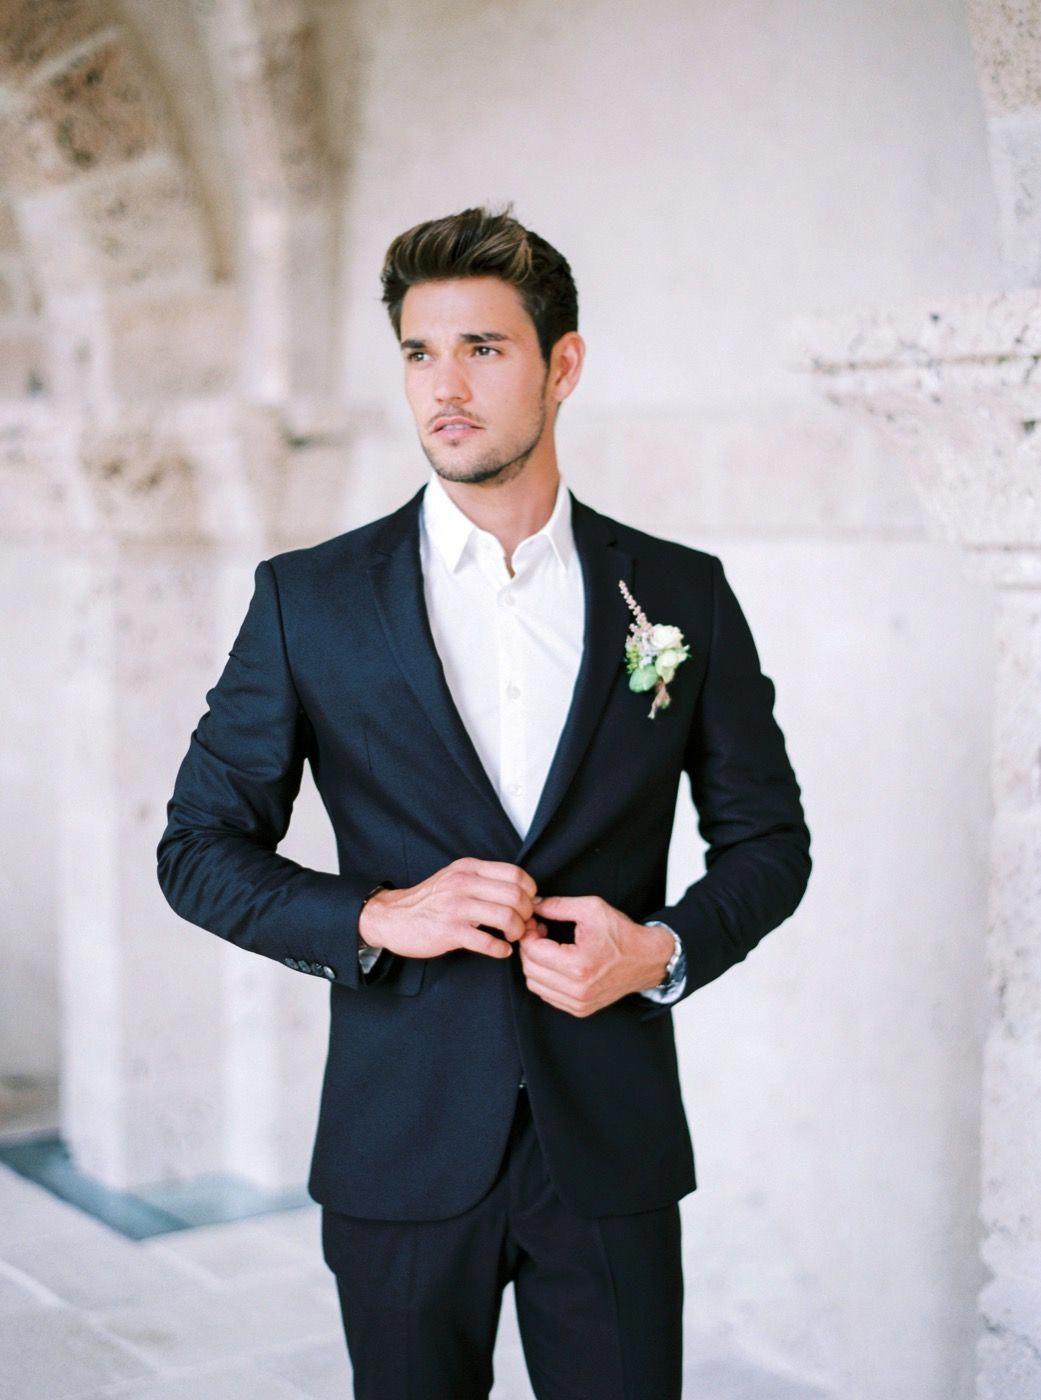 периода одежда на свадьбу для мужчин фото надежна прихотлива